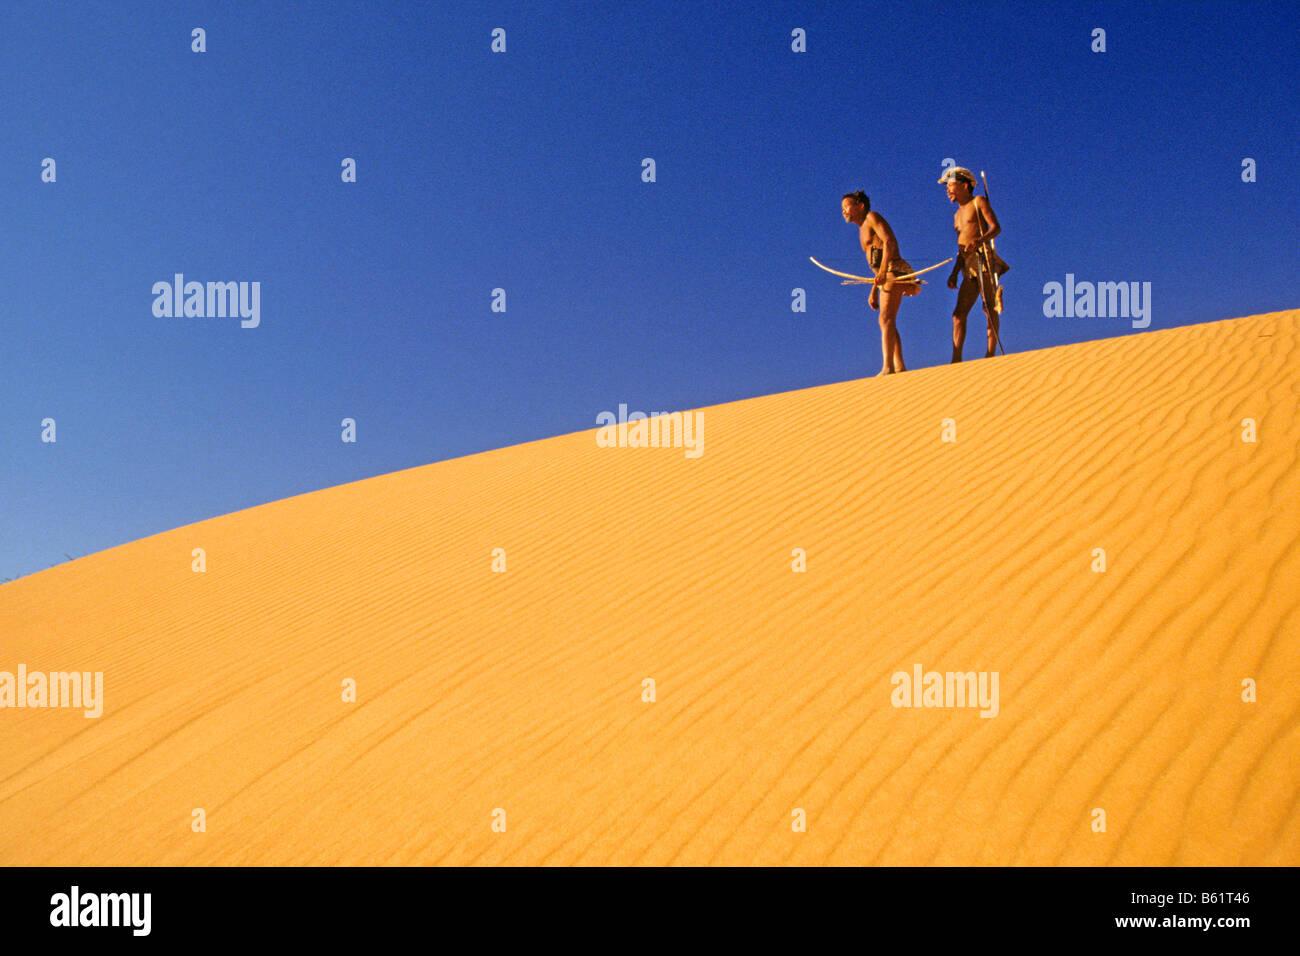 Bushman (San), men on sand dune - Stock Image